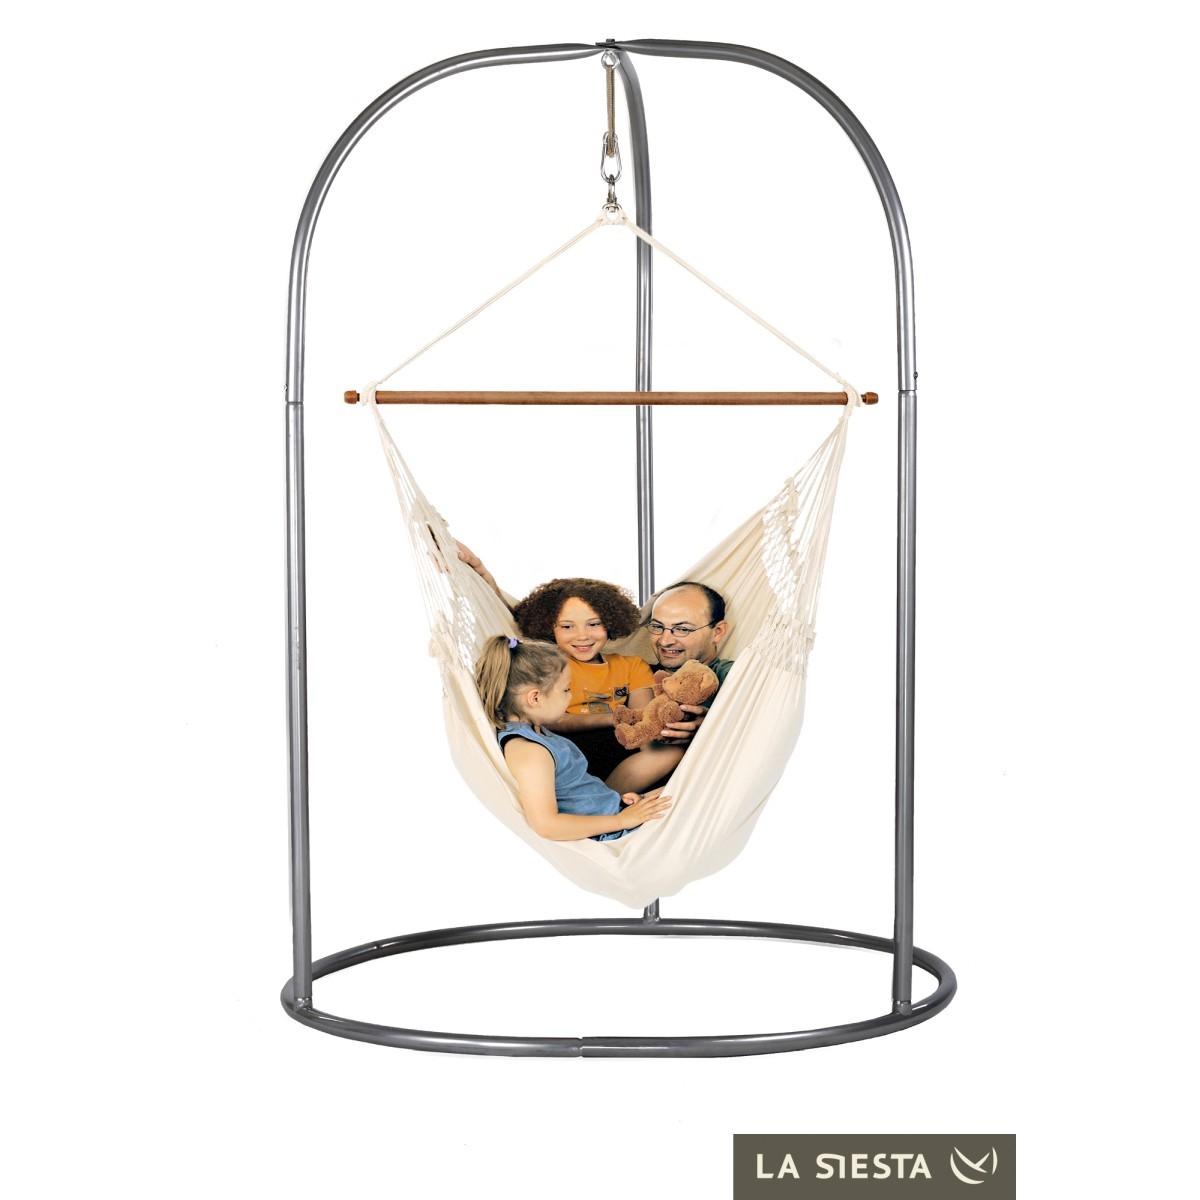 la siesta chaise hamac kingsize cari o cru support romano. Black Bedroom Furniture Sets. Home Design Ideas